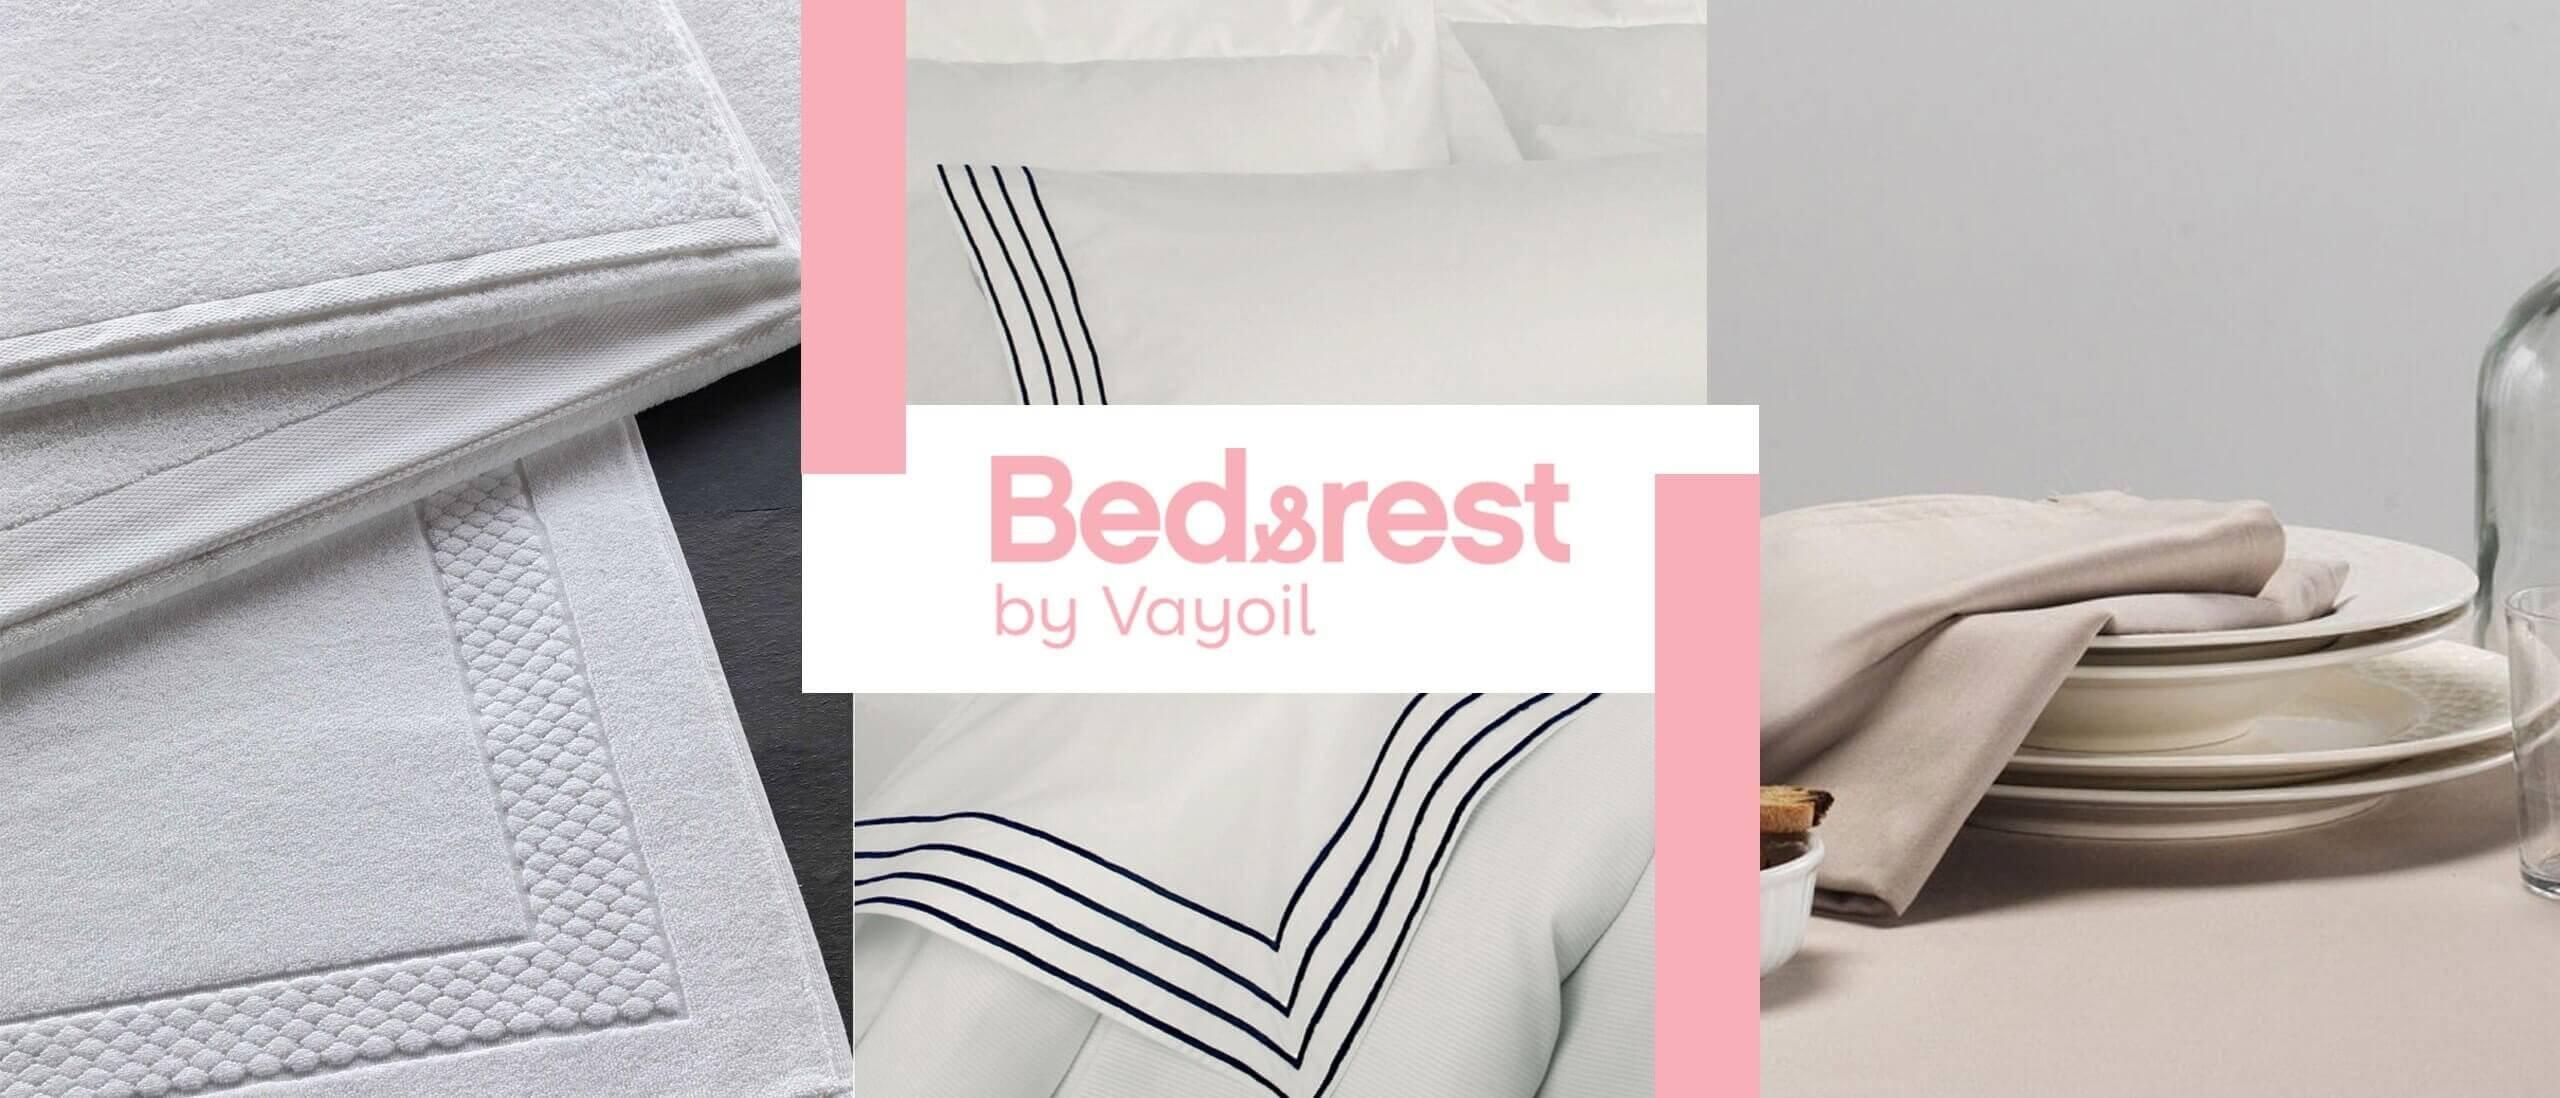 Bed&Rest Shop